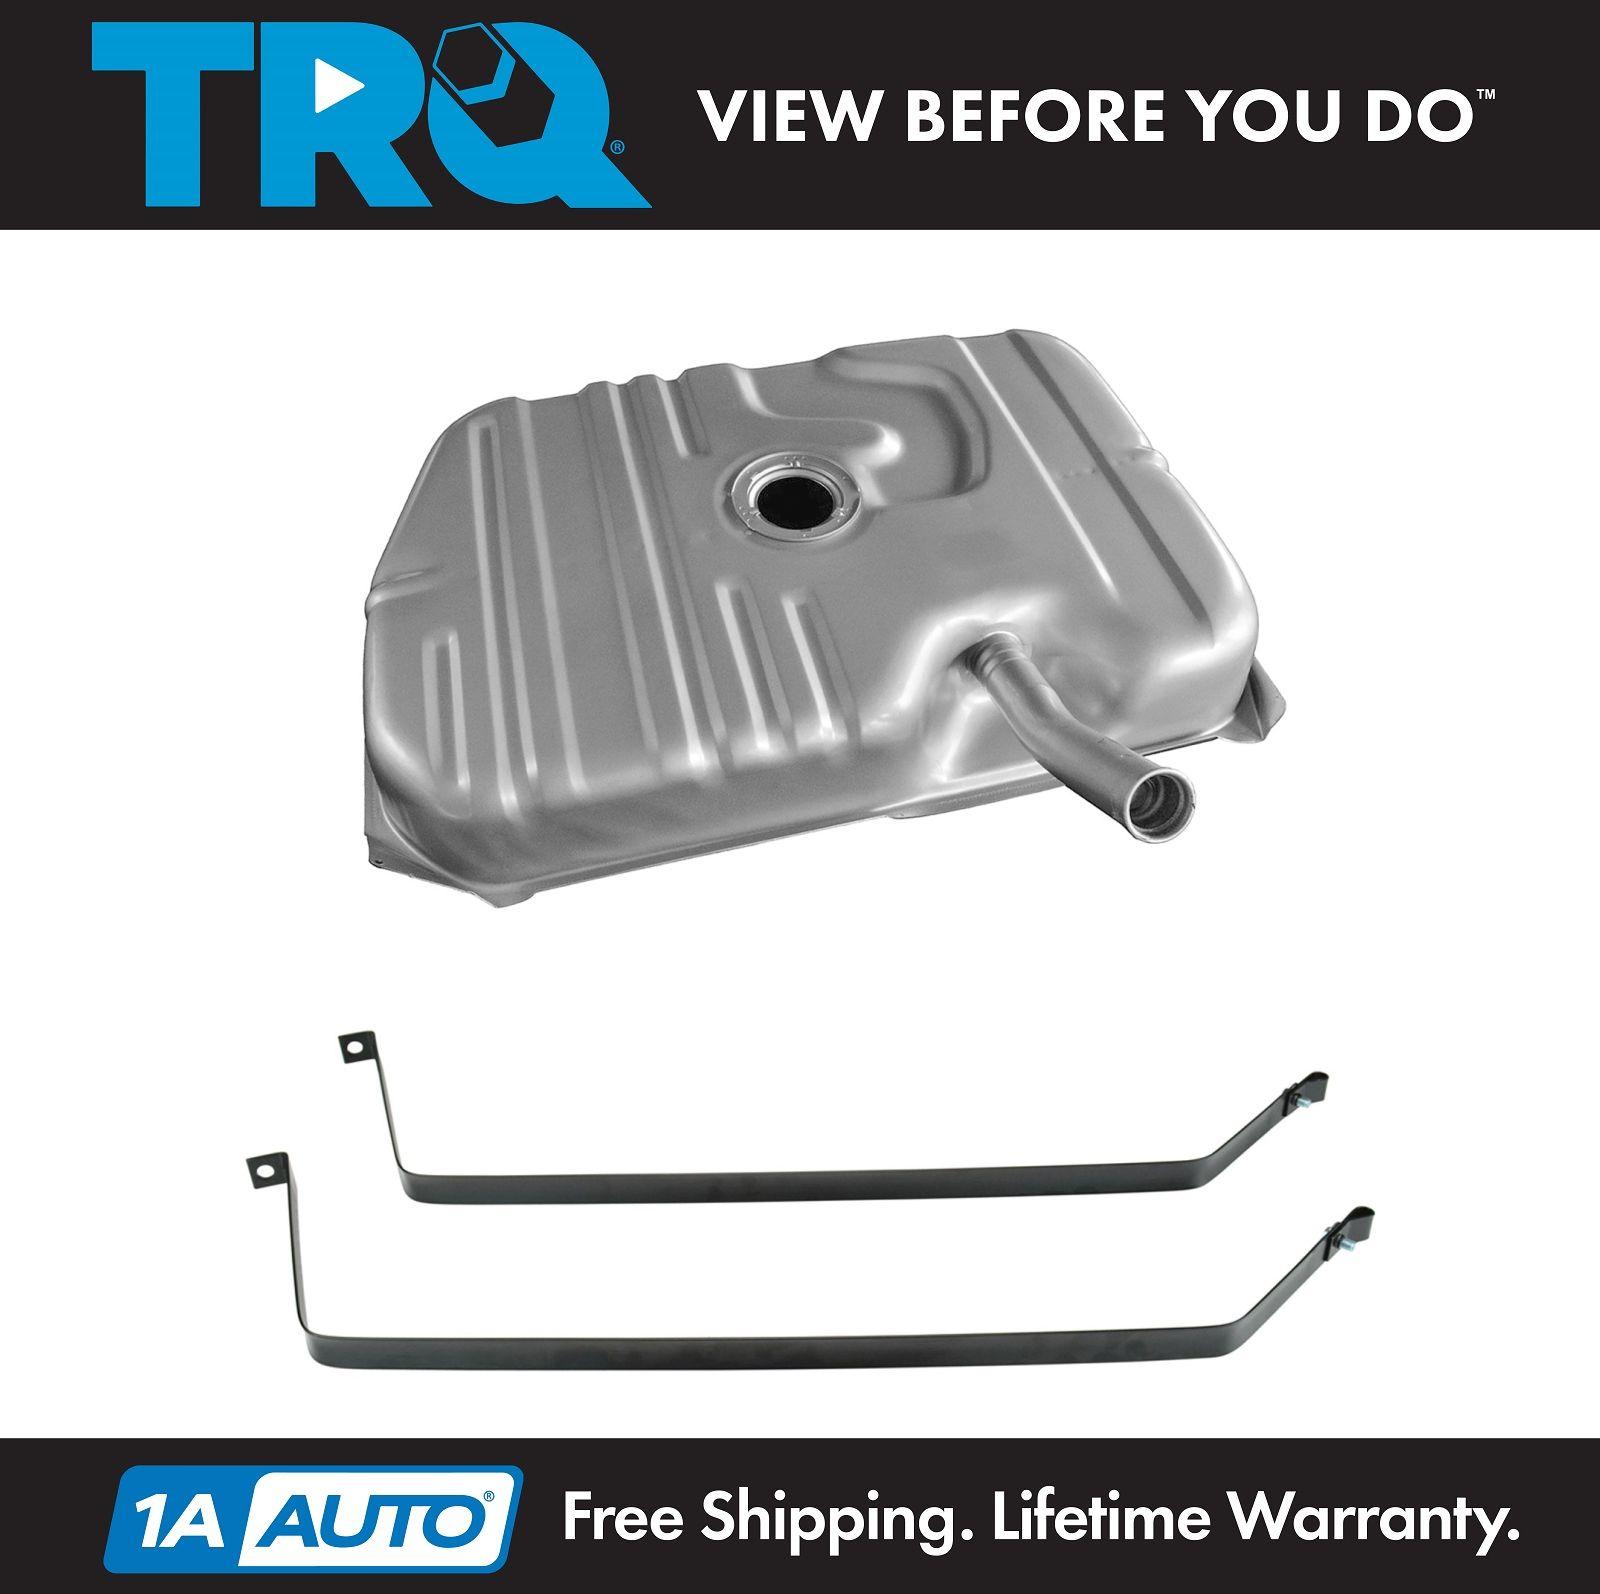 Gas Fuel Tank 17 Gallon w// Strap Kit Set for Century Regal Cutlass//Supreme RWD